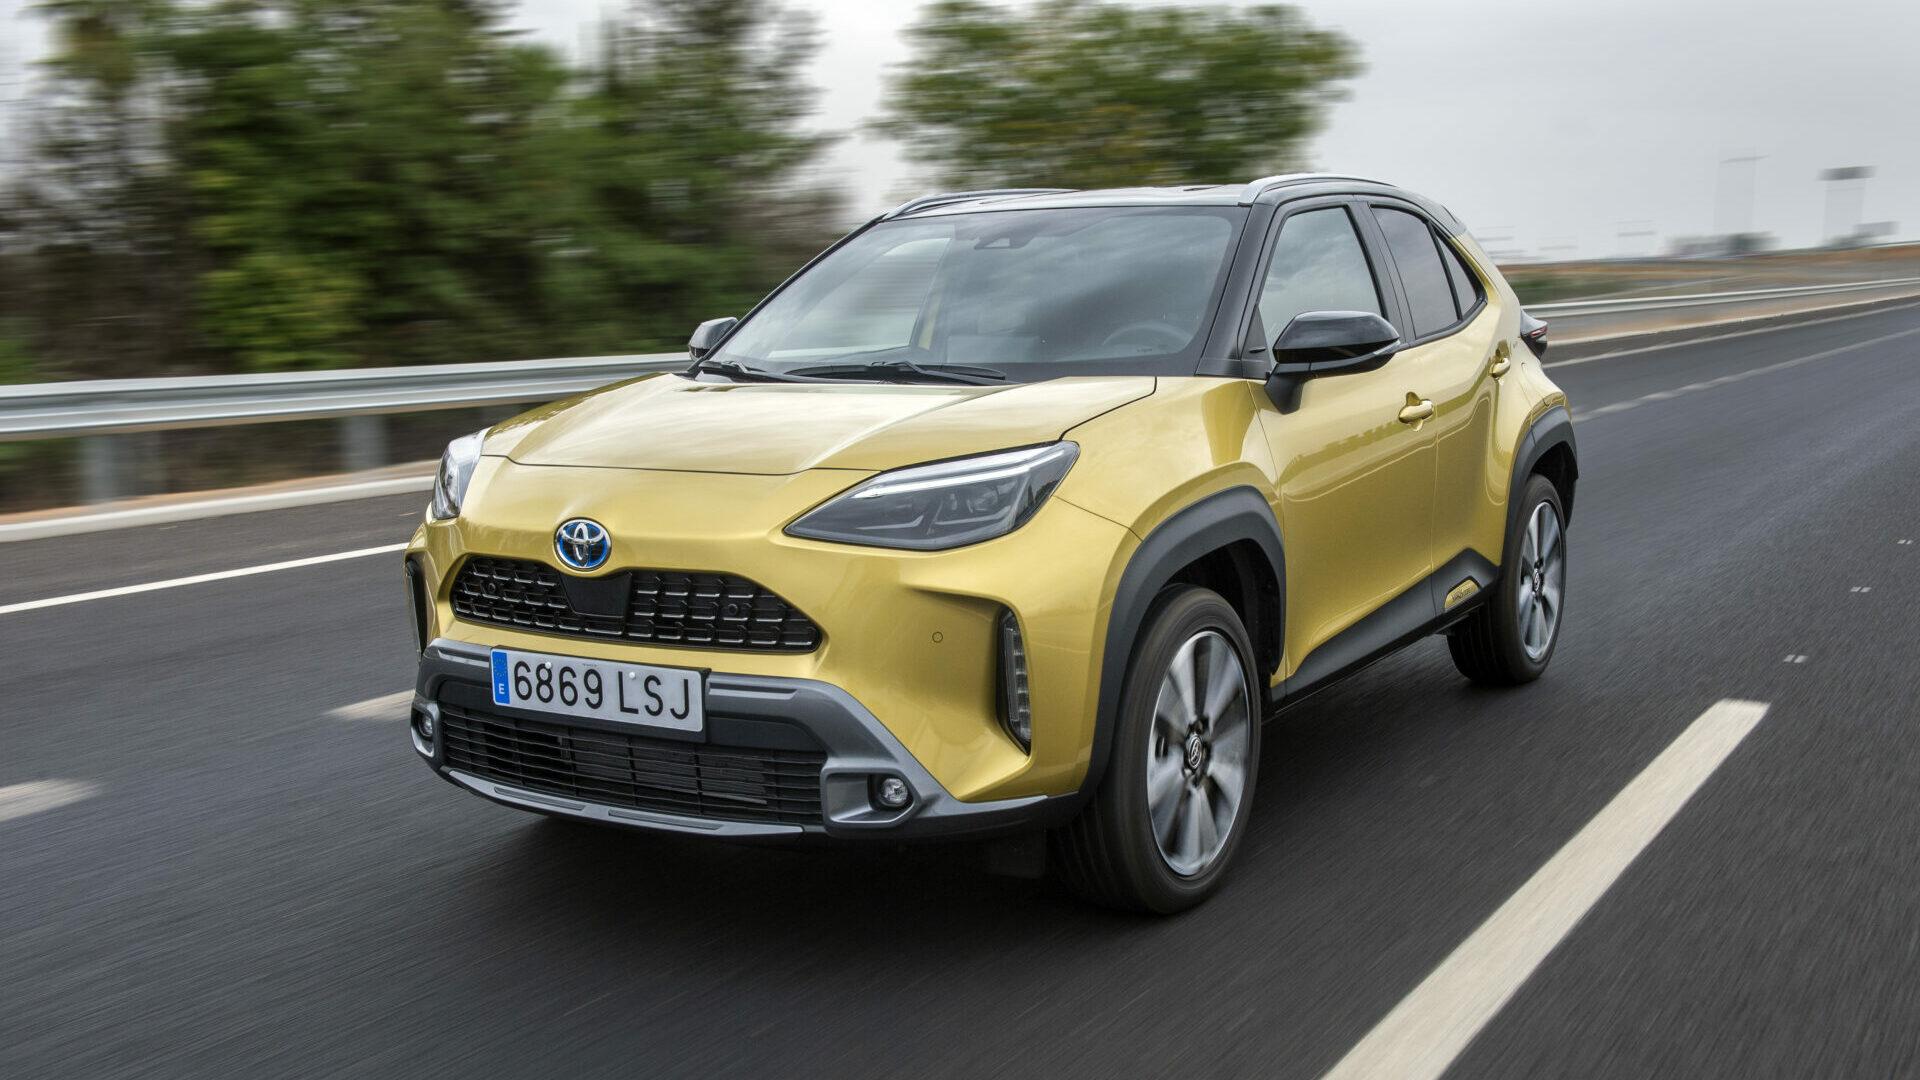 Nuevo Toyota Yaris Cross 2021: probamos este SUV urbano con etiqueta ECO